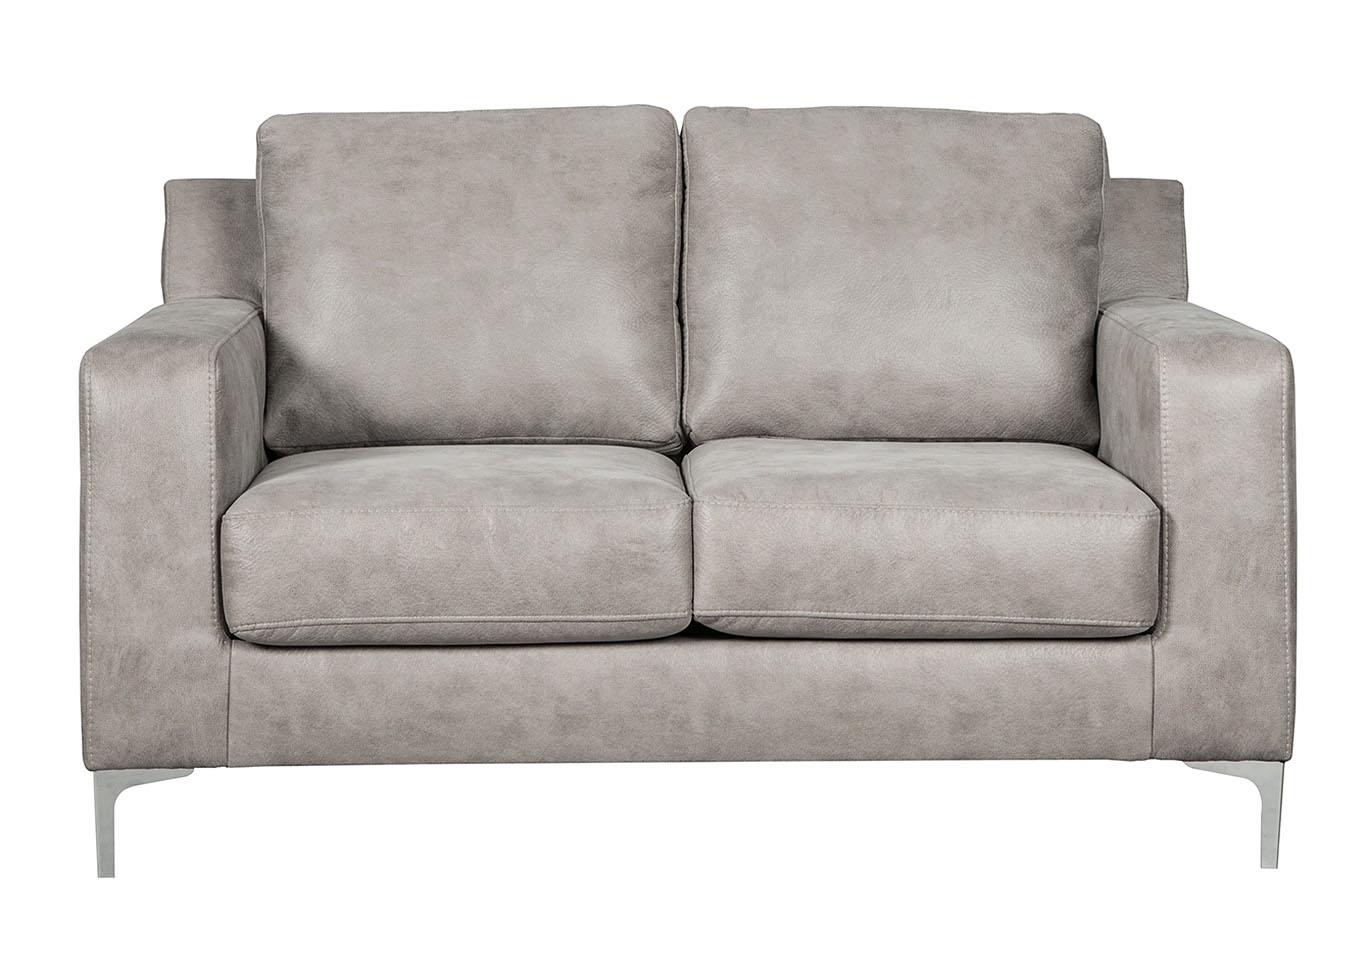 Pleasing Direct Buy Furniture Philadelphia Pa Ryler Steel Loveseat Download Free Architecture Designs Crovemadebymaigaardcom